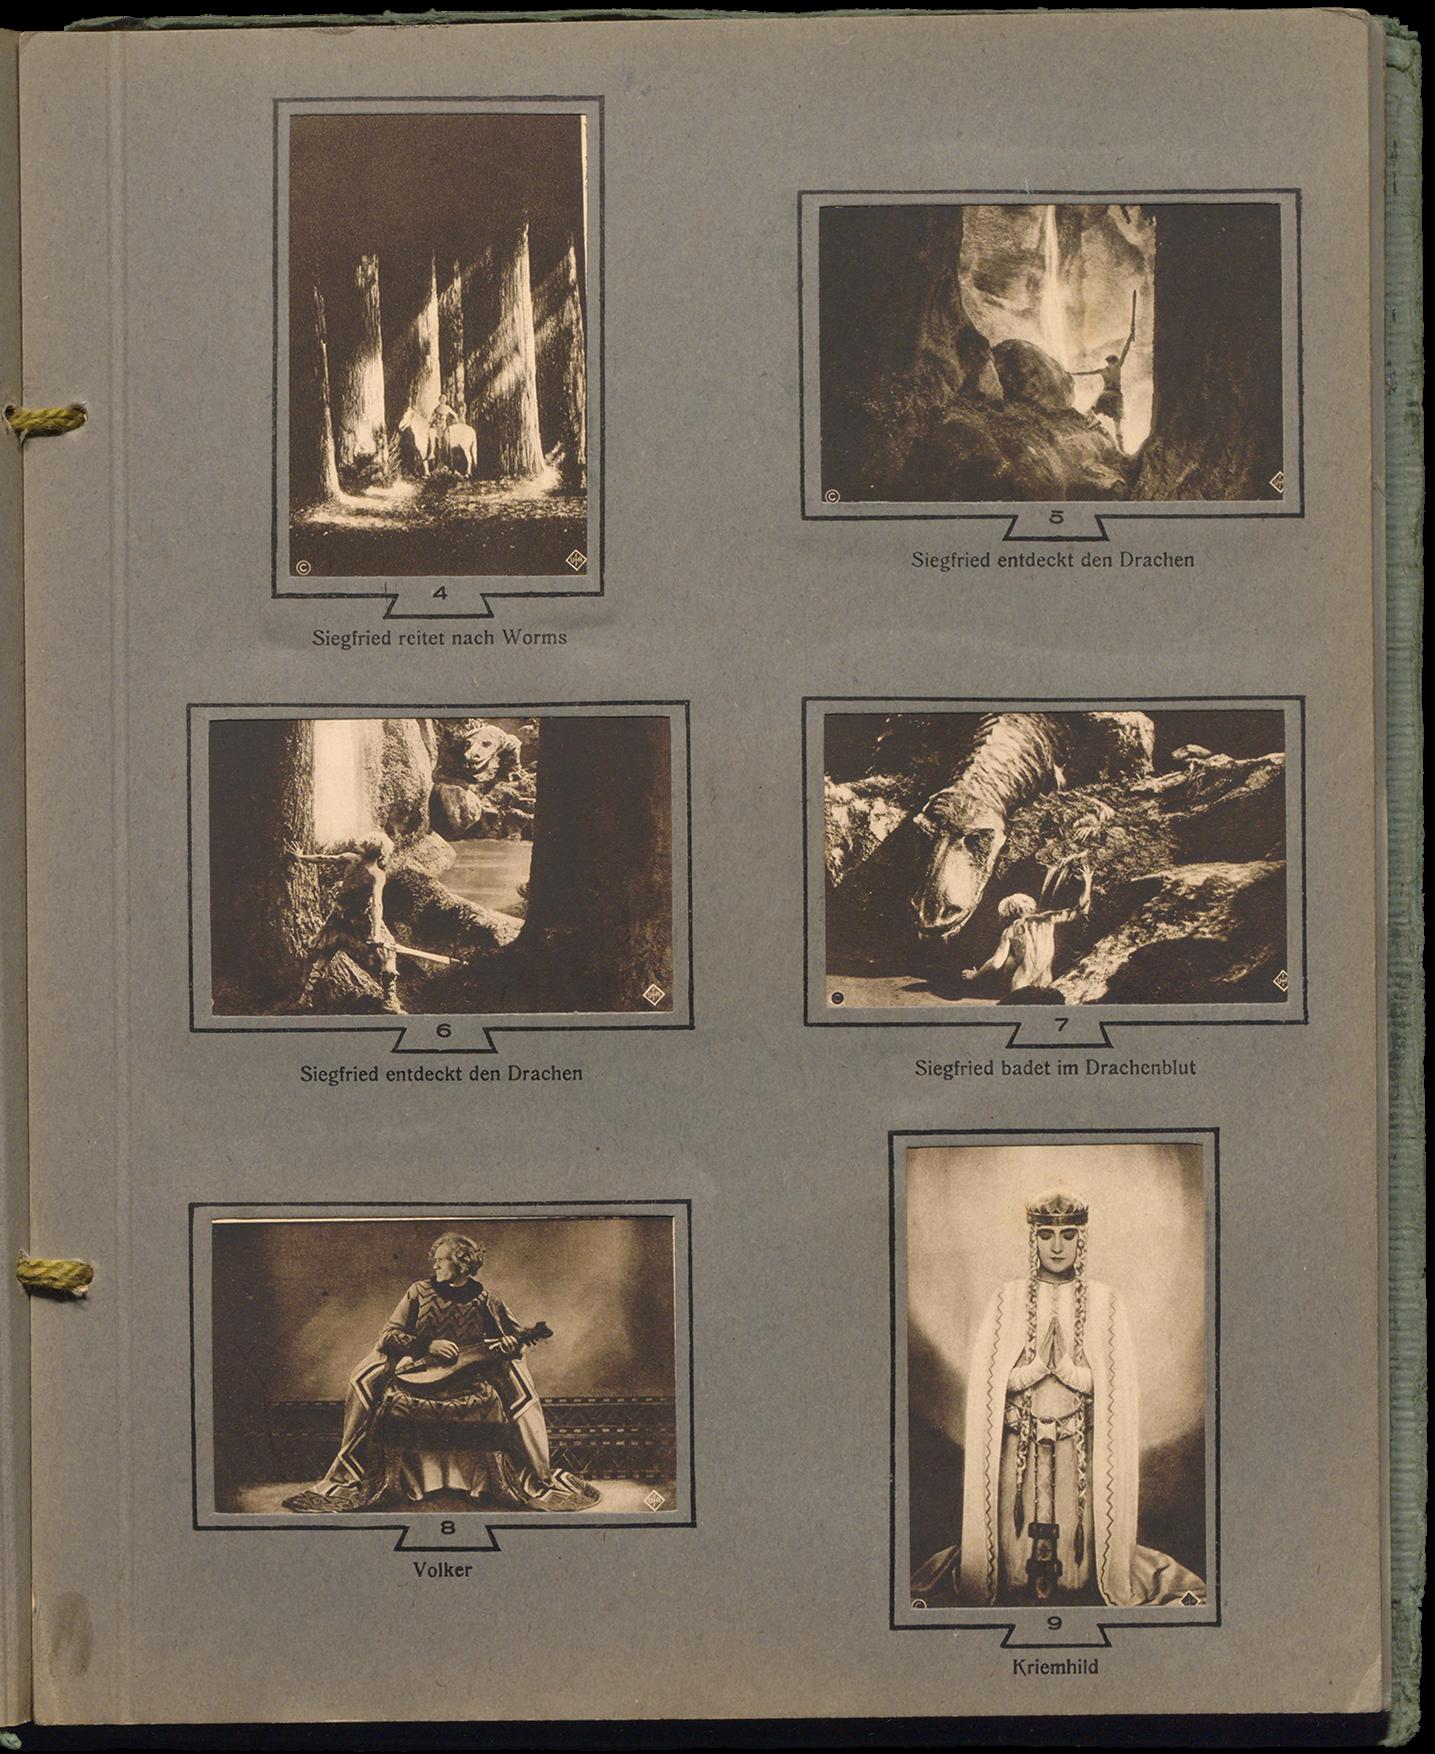 635413_Fritz Lang.png